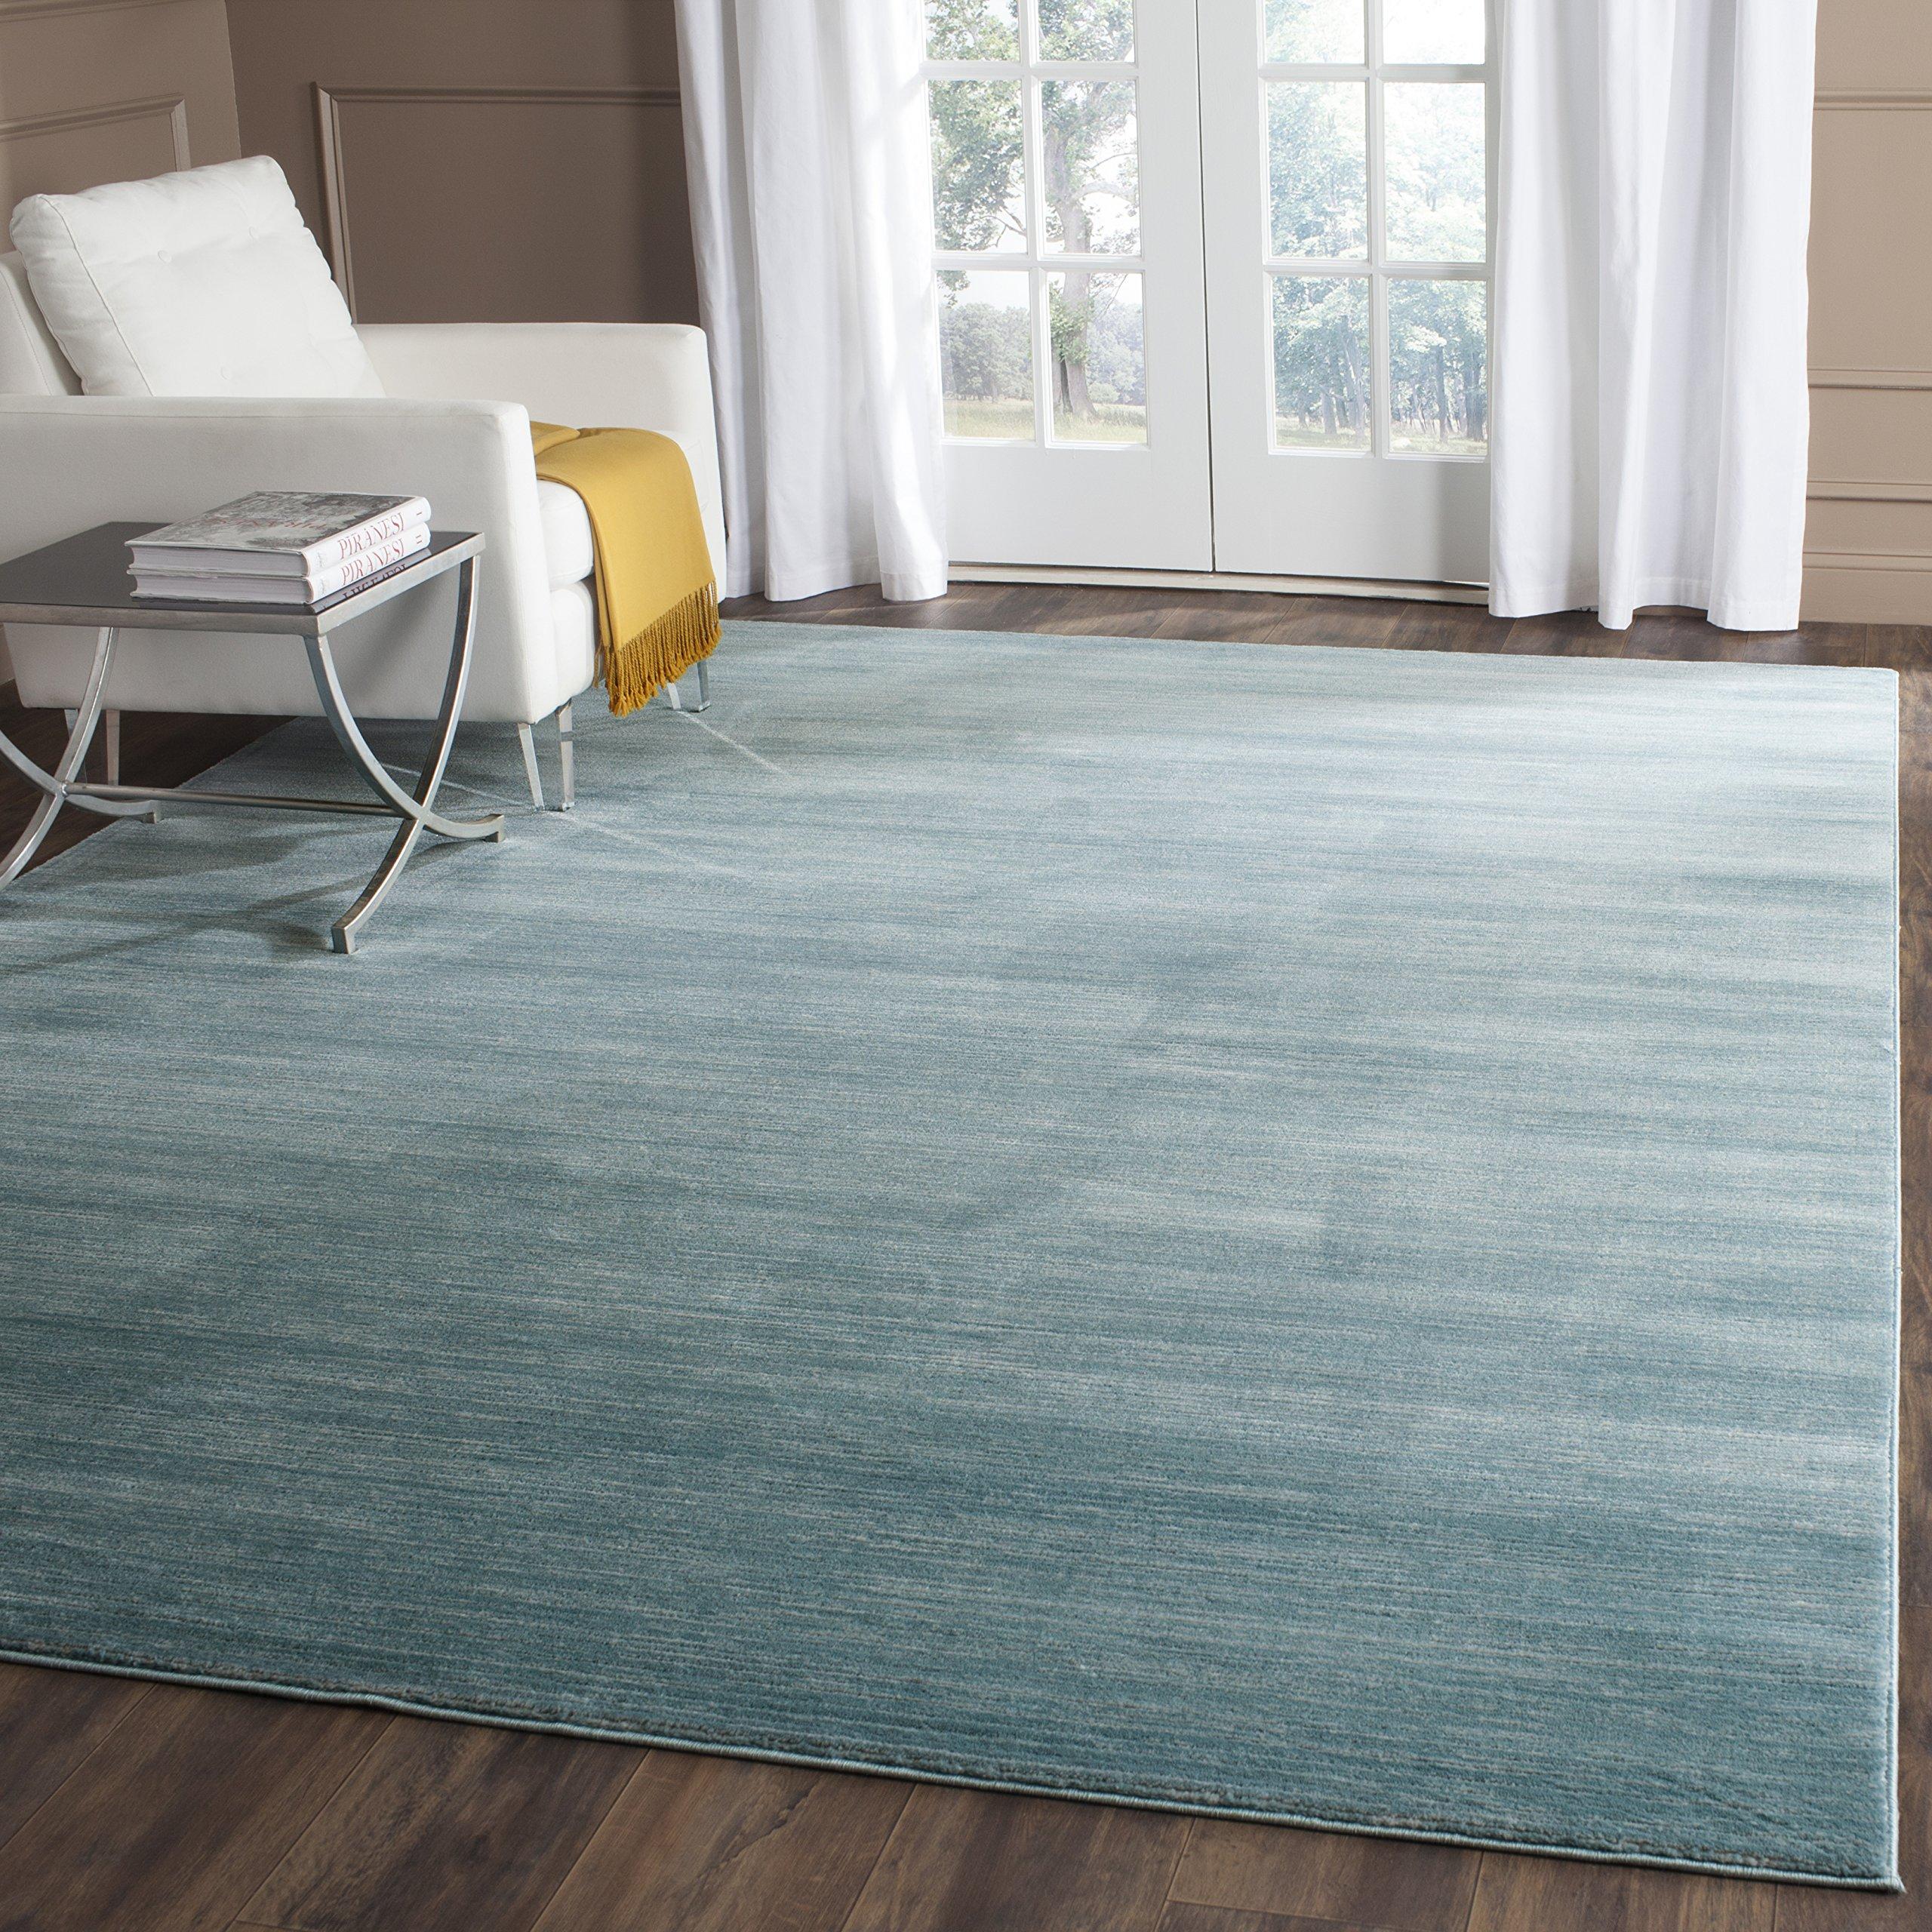 Safavieh Vision Collection VSN606B Aqua Blue Tonal Area Rug (8' x 10') by Safavieh